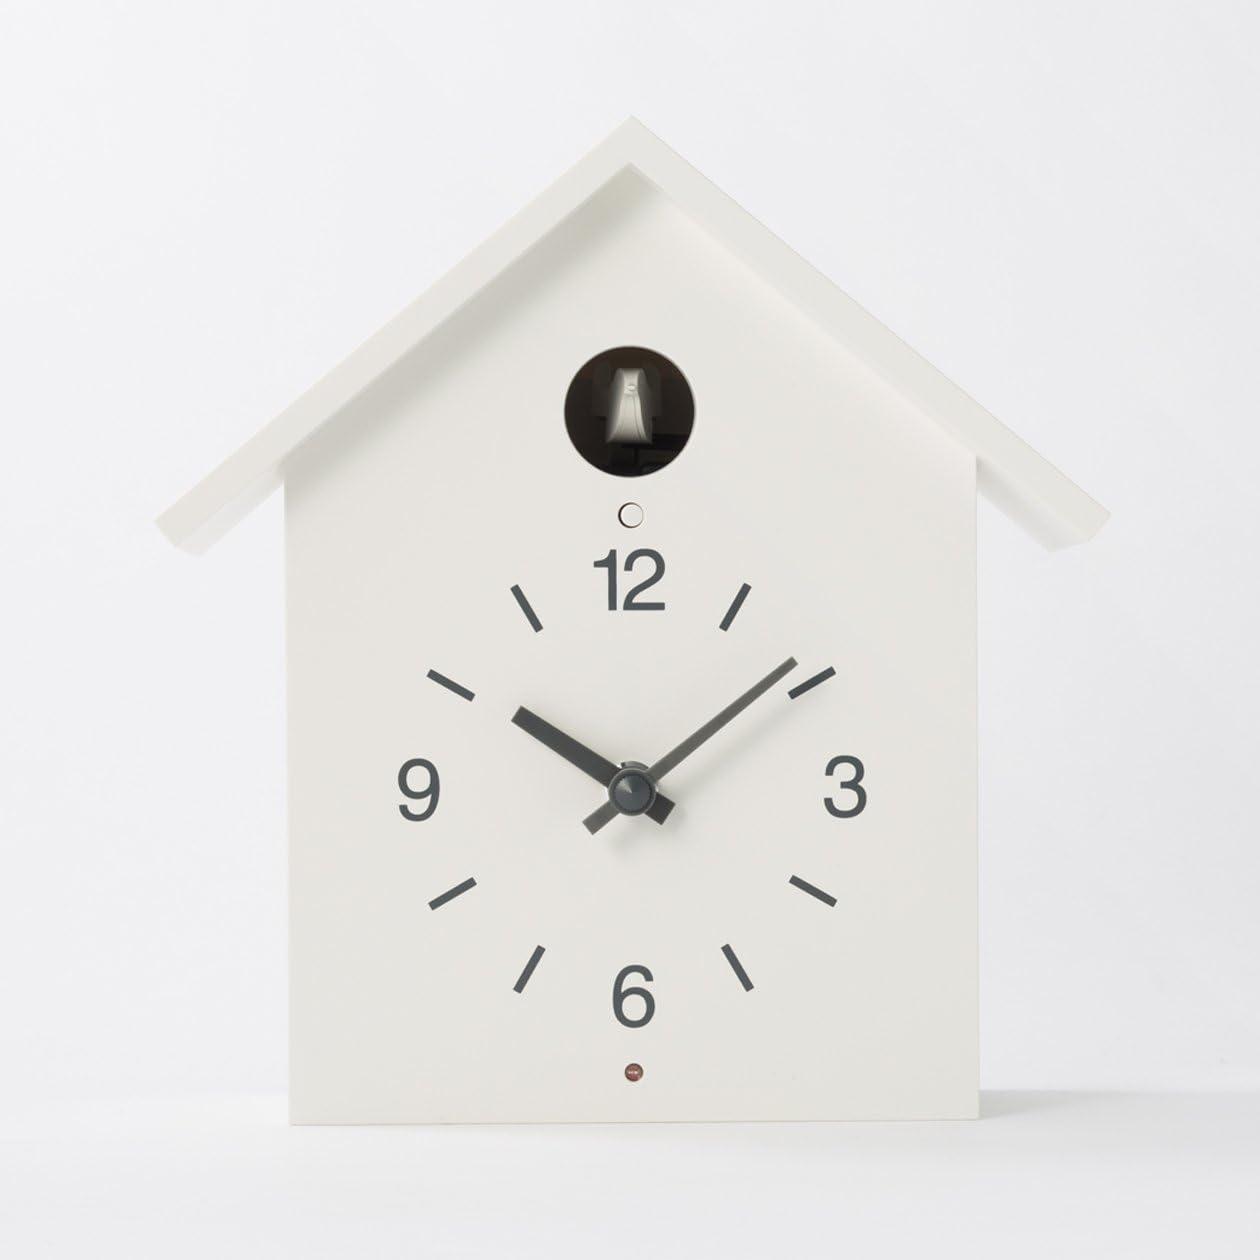 MUJI Cuckoo Clock White – Large size